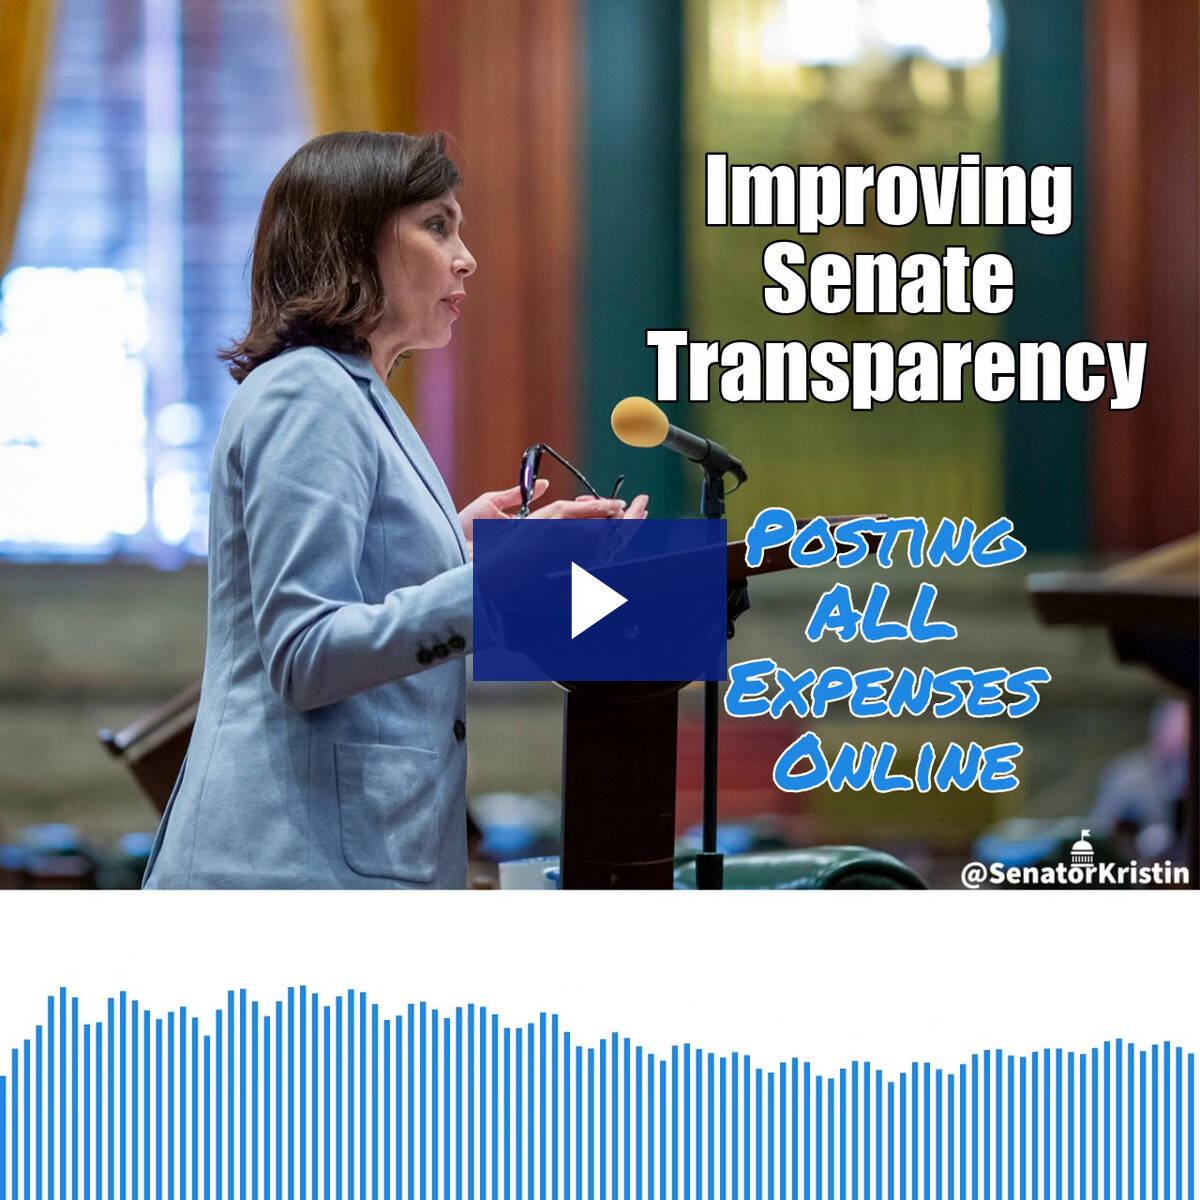 8/12/21 - Senate Transparency Efforts